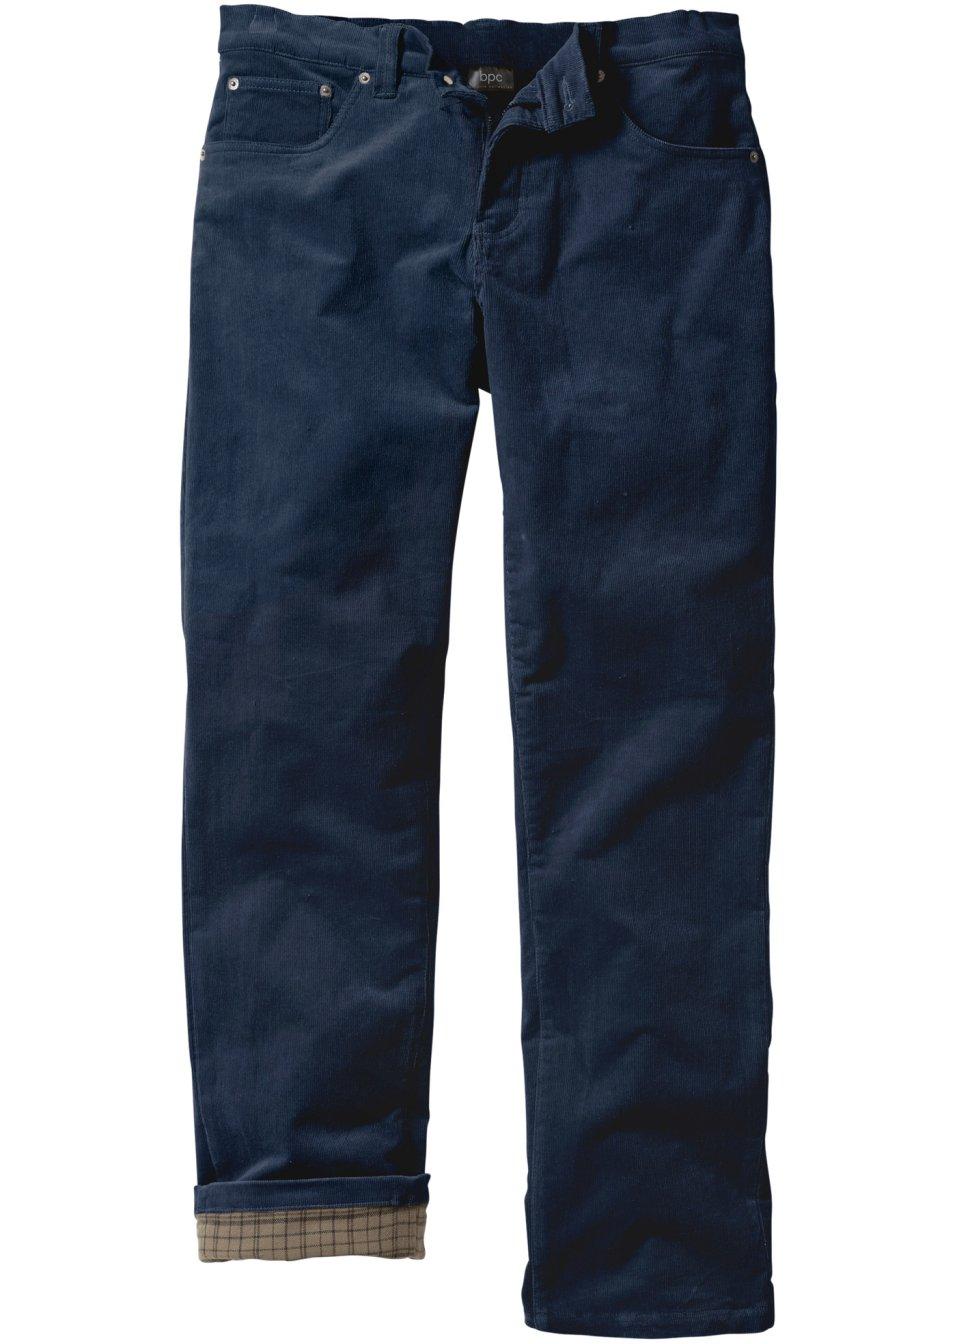 pantalon en velours c tel extensible thermo n bleu. Black Bedroom Furniture Sets. Home Design Ideas